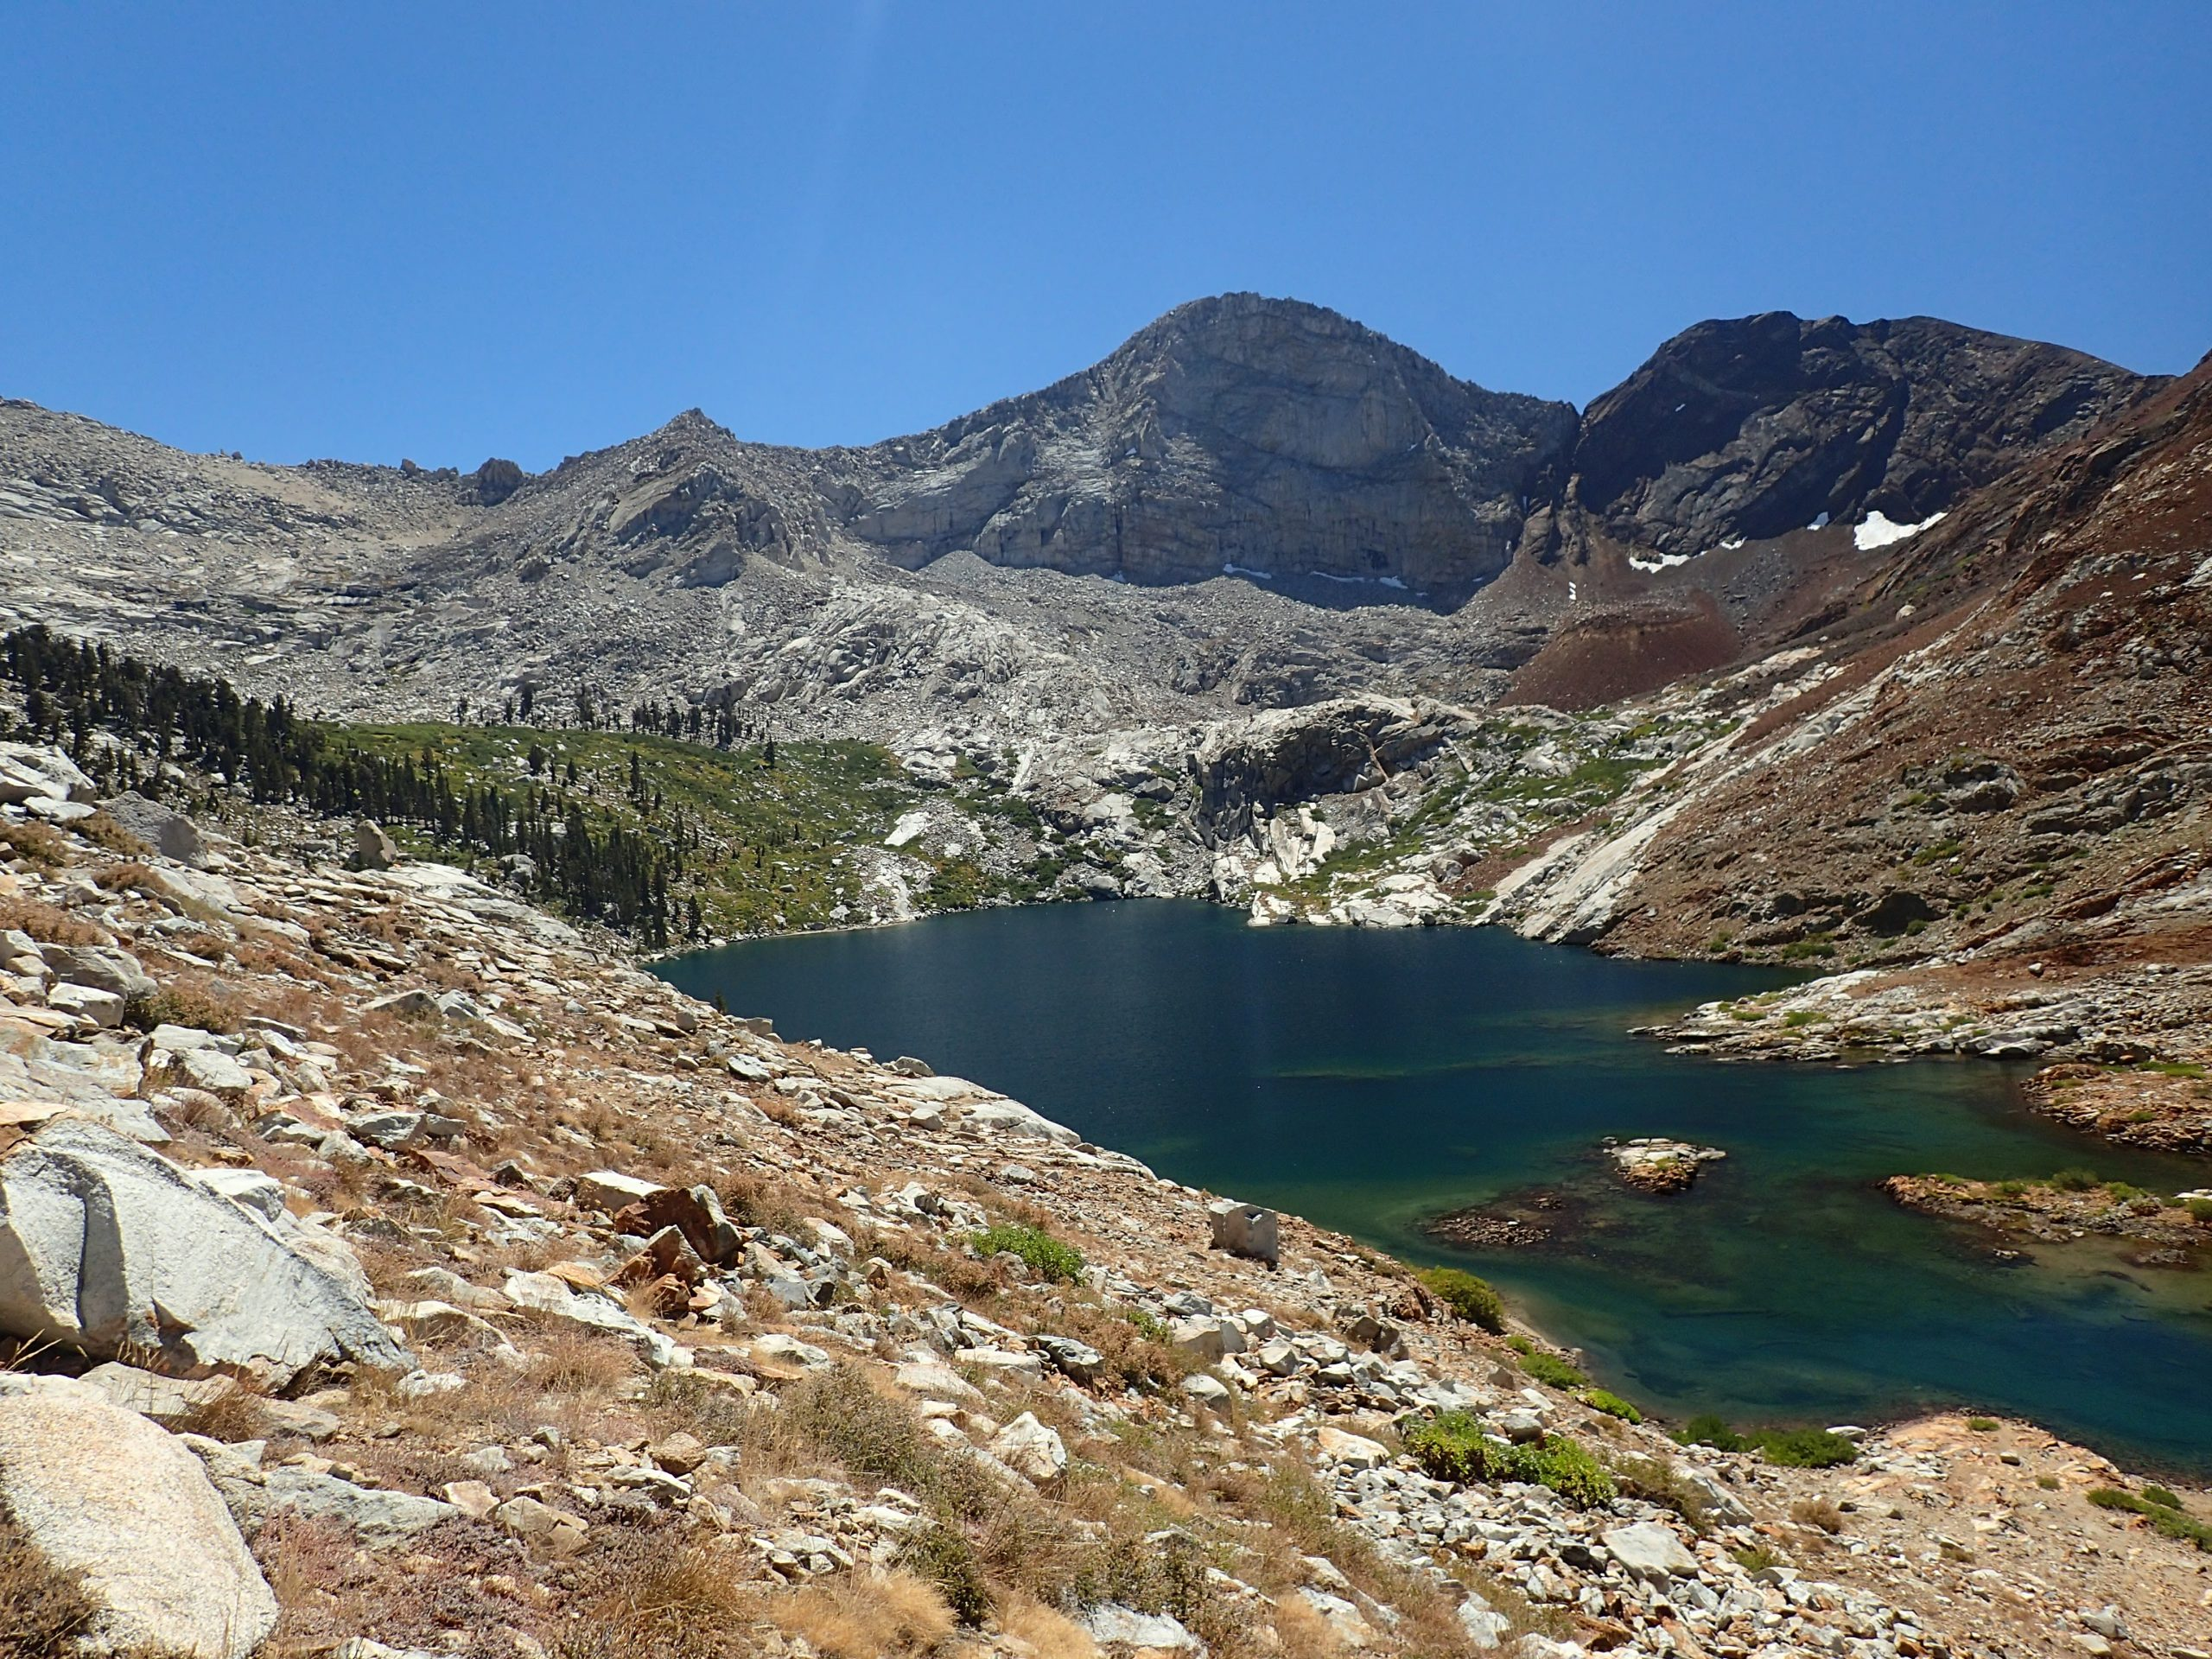 Franklin Lakes at Mineral King